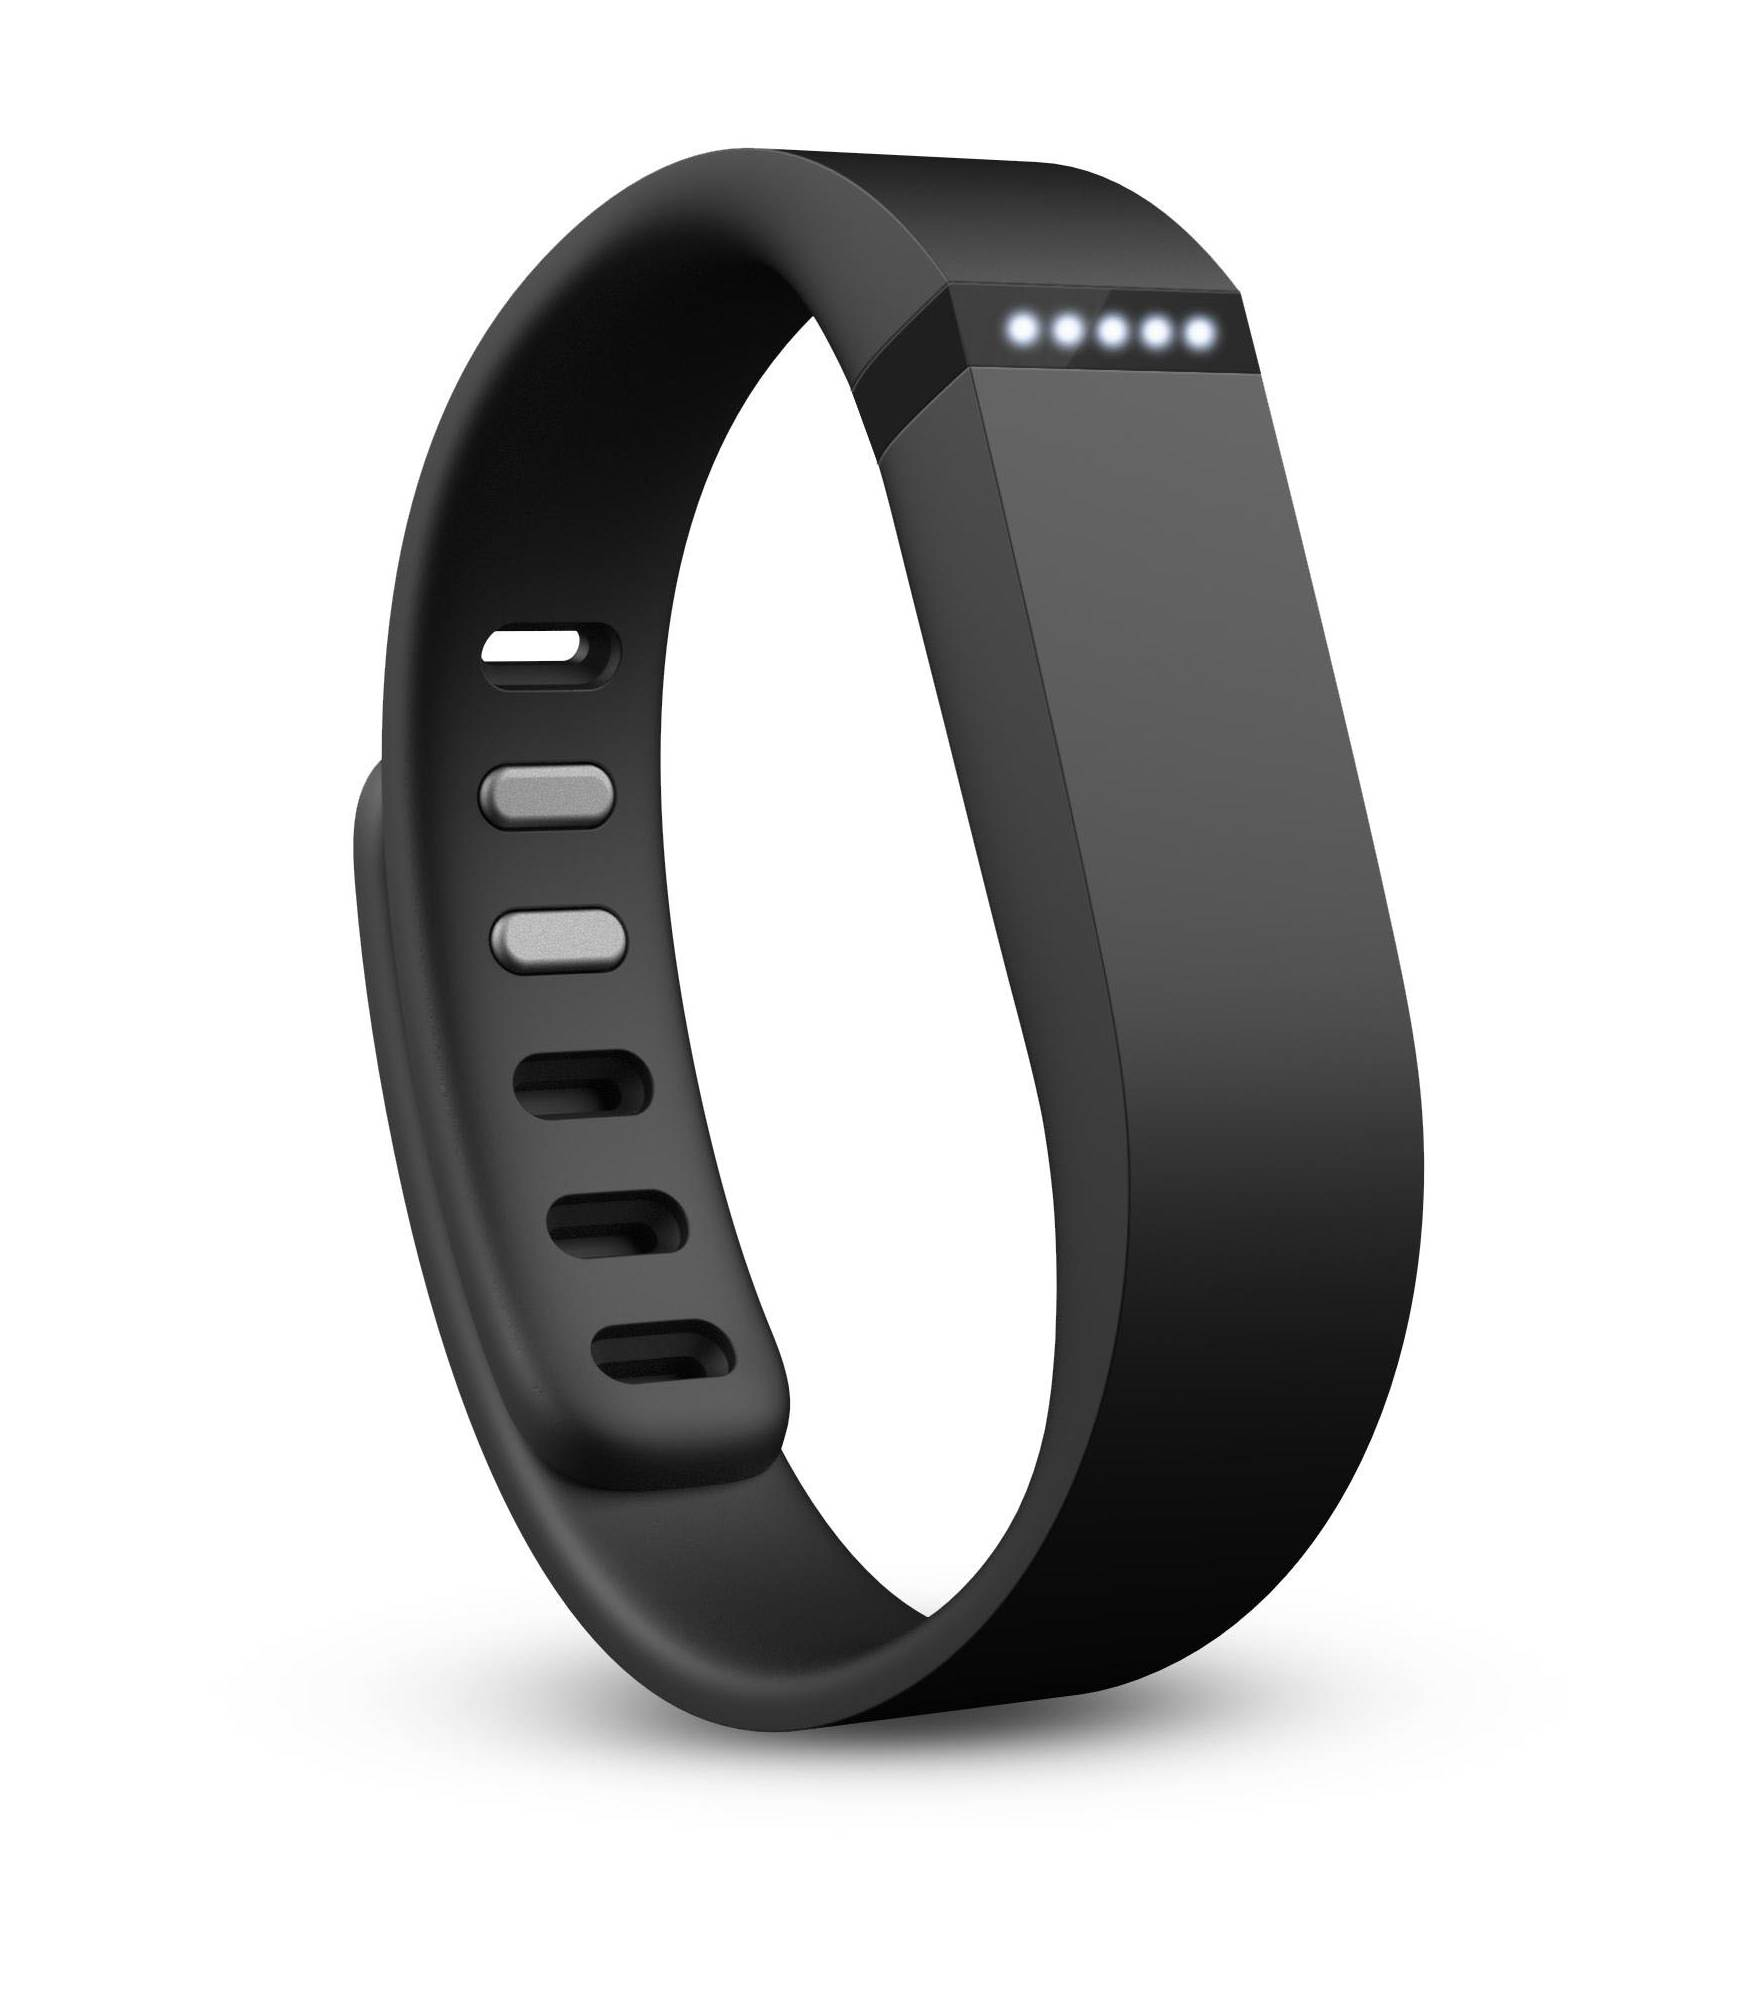 Fitbit Flex Wireless Activity & Sleep Wristband | Pinterest Picks - Father's Day Gift Ideas